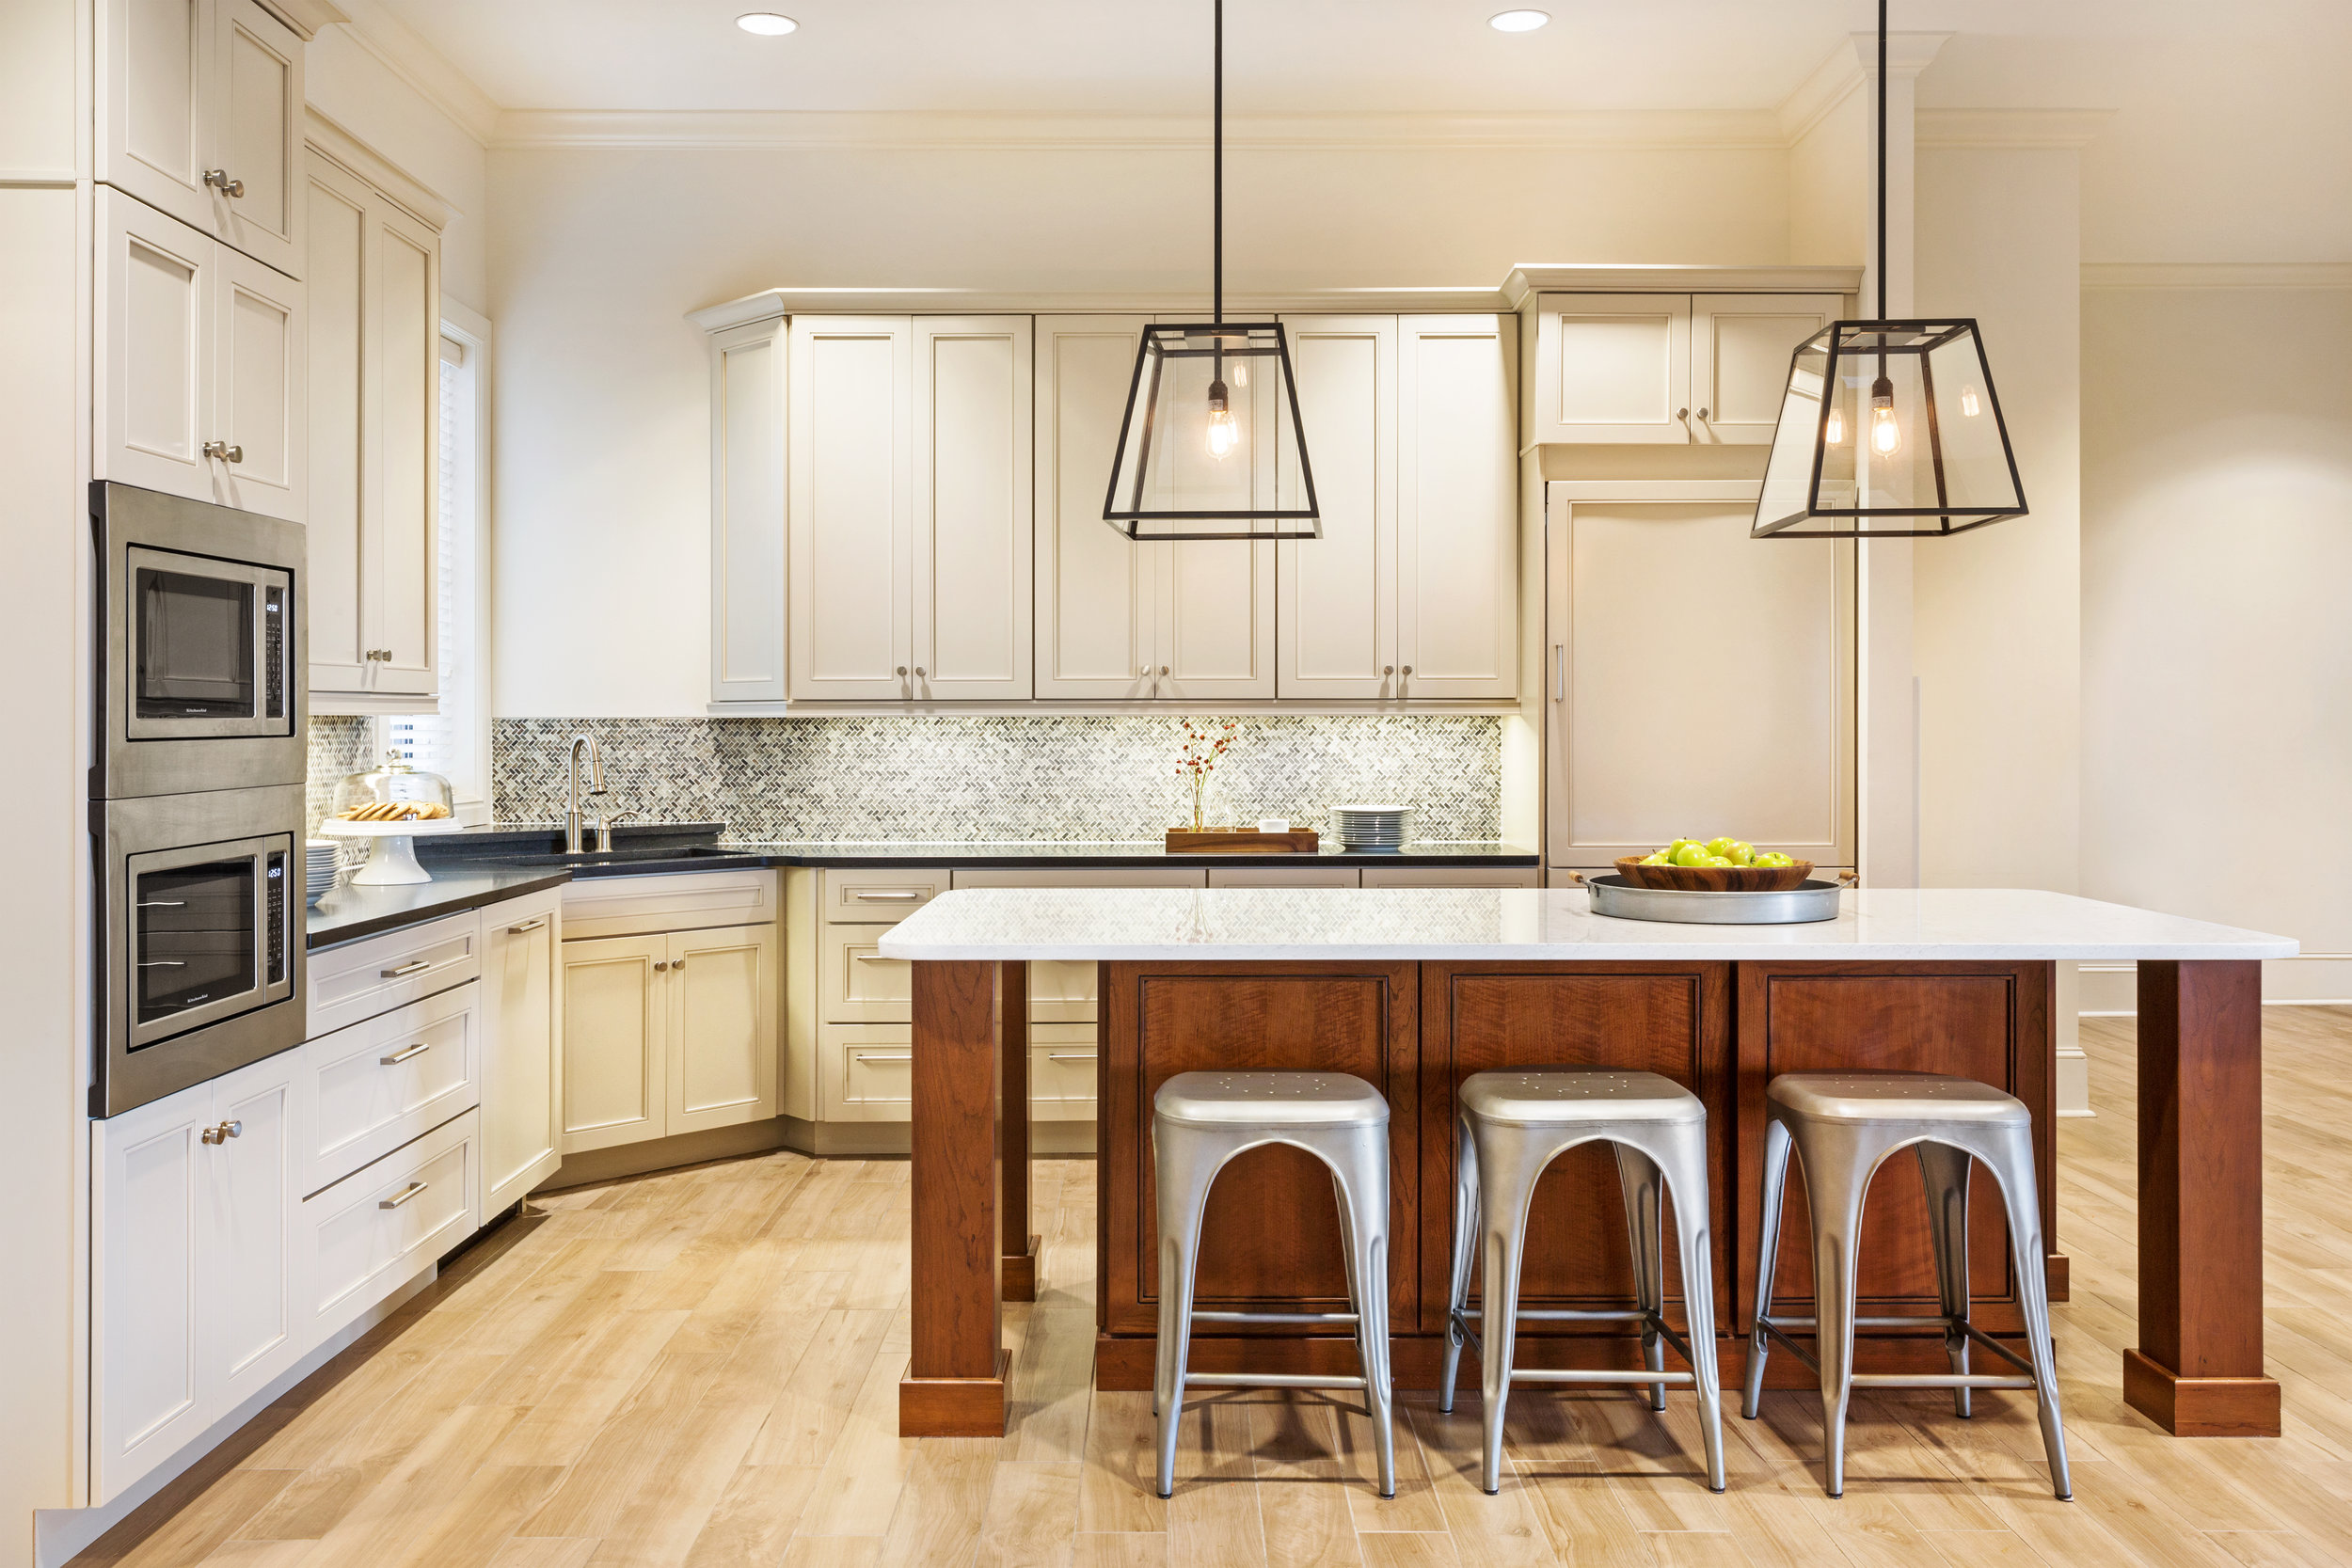 Hospitality_Design_Knoxville_Kitchen_Delta_Gamma